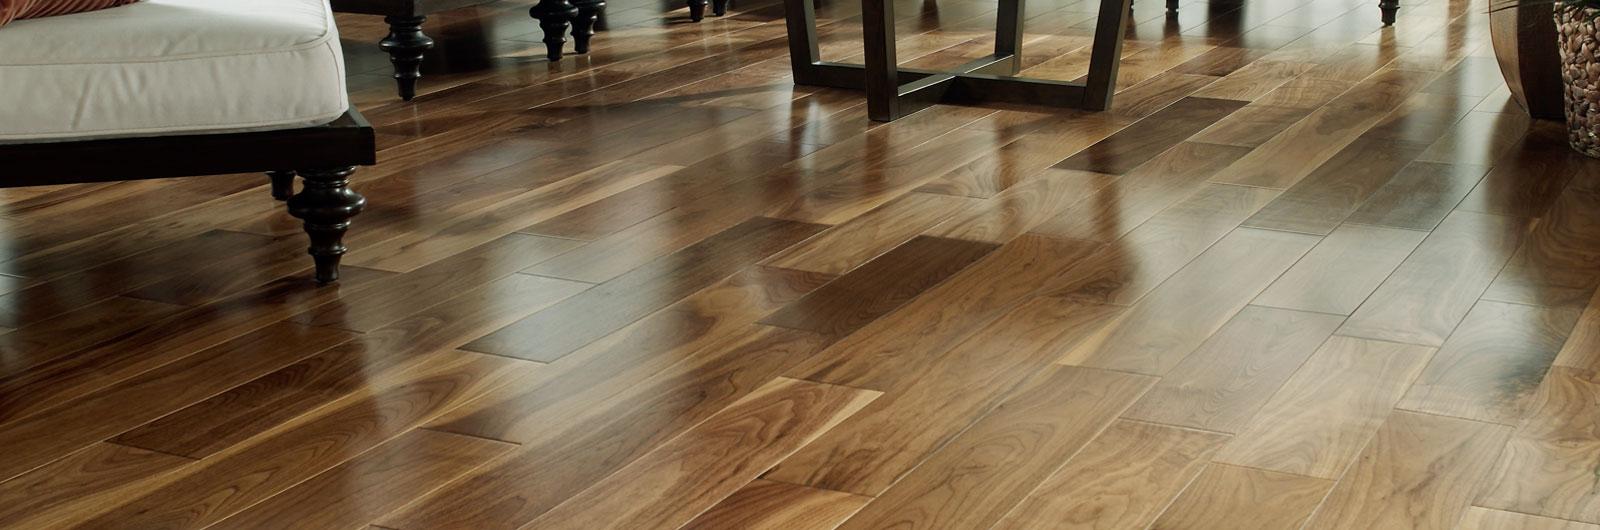 Hardwood Flooring  Ashawa Bay Flooring